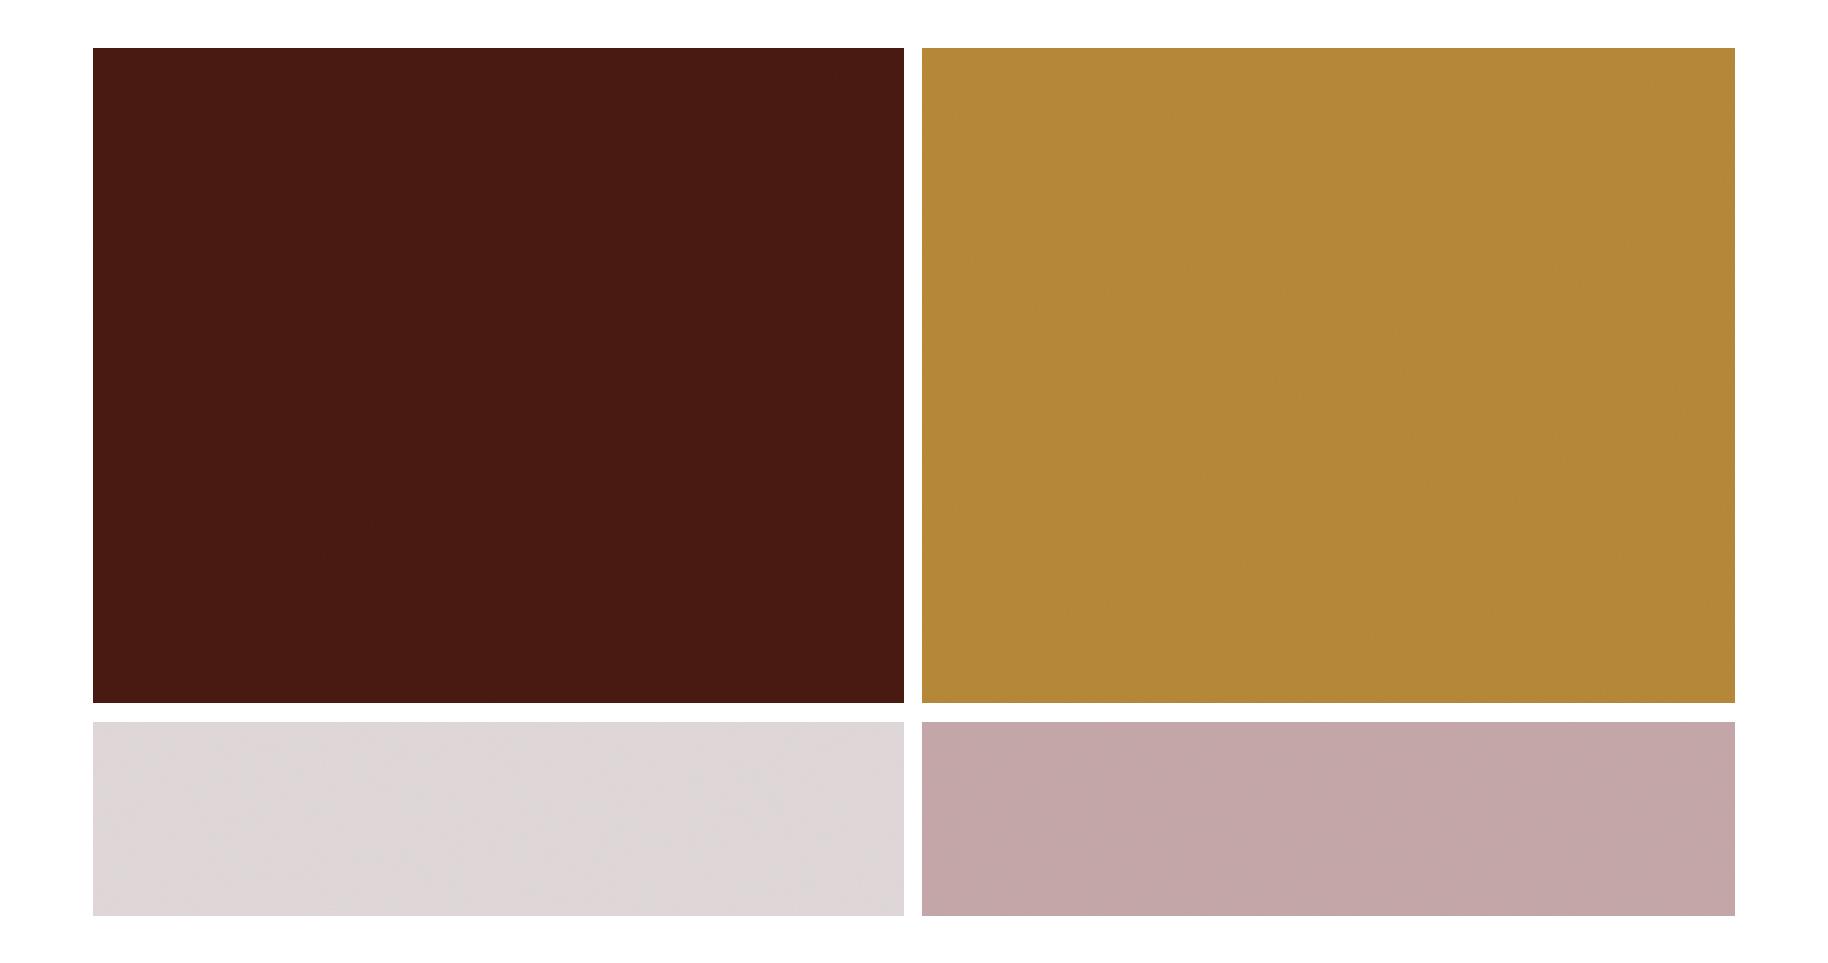 Autumn Wedding Color Scheme - True North Paper Co.